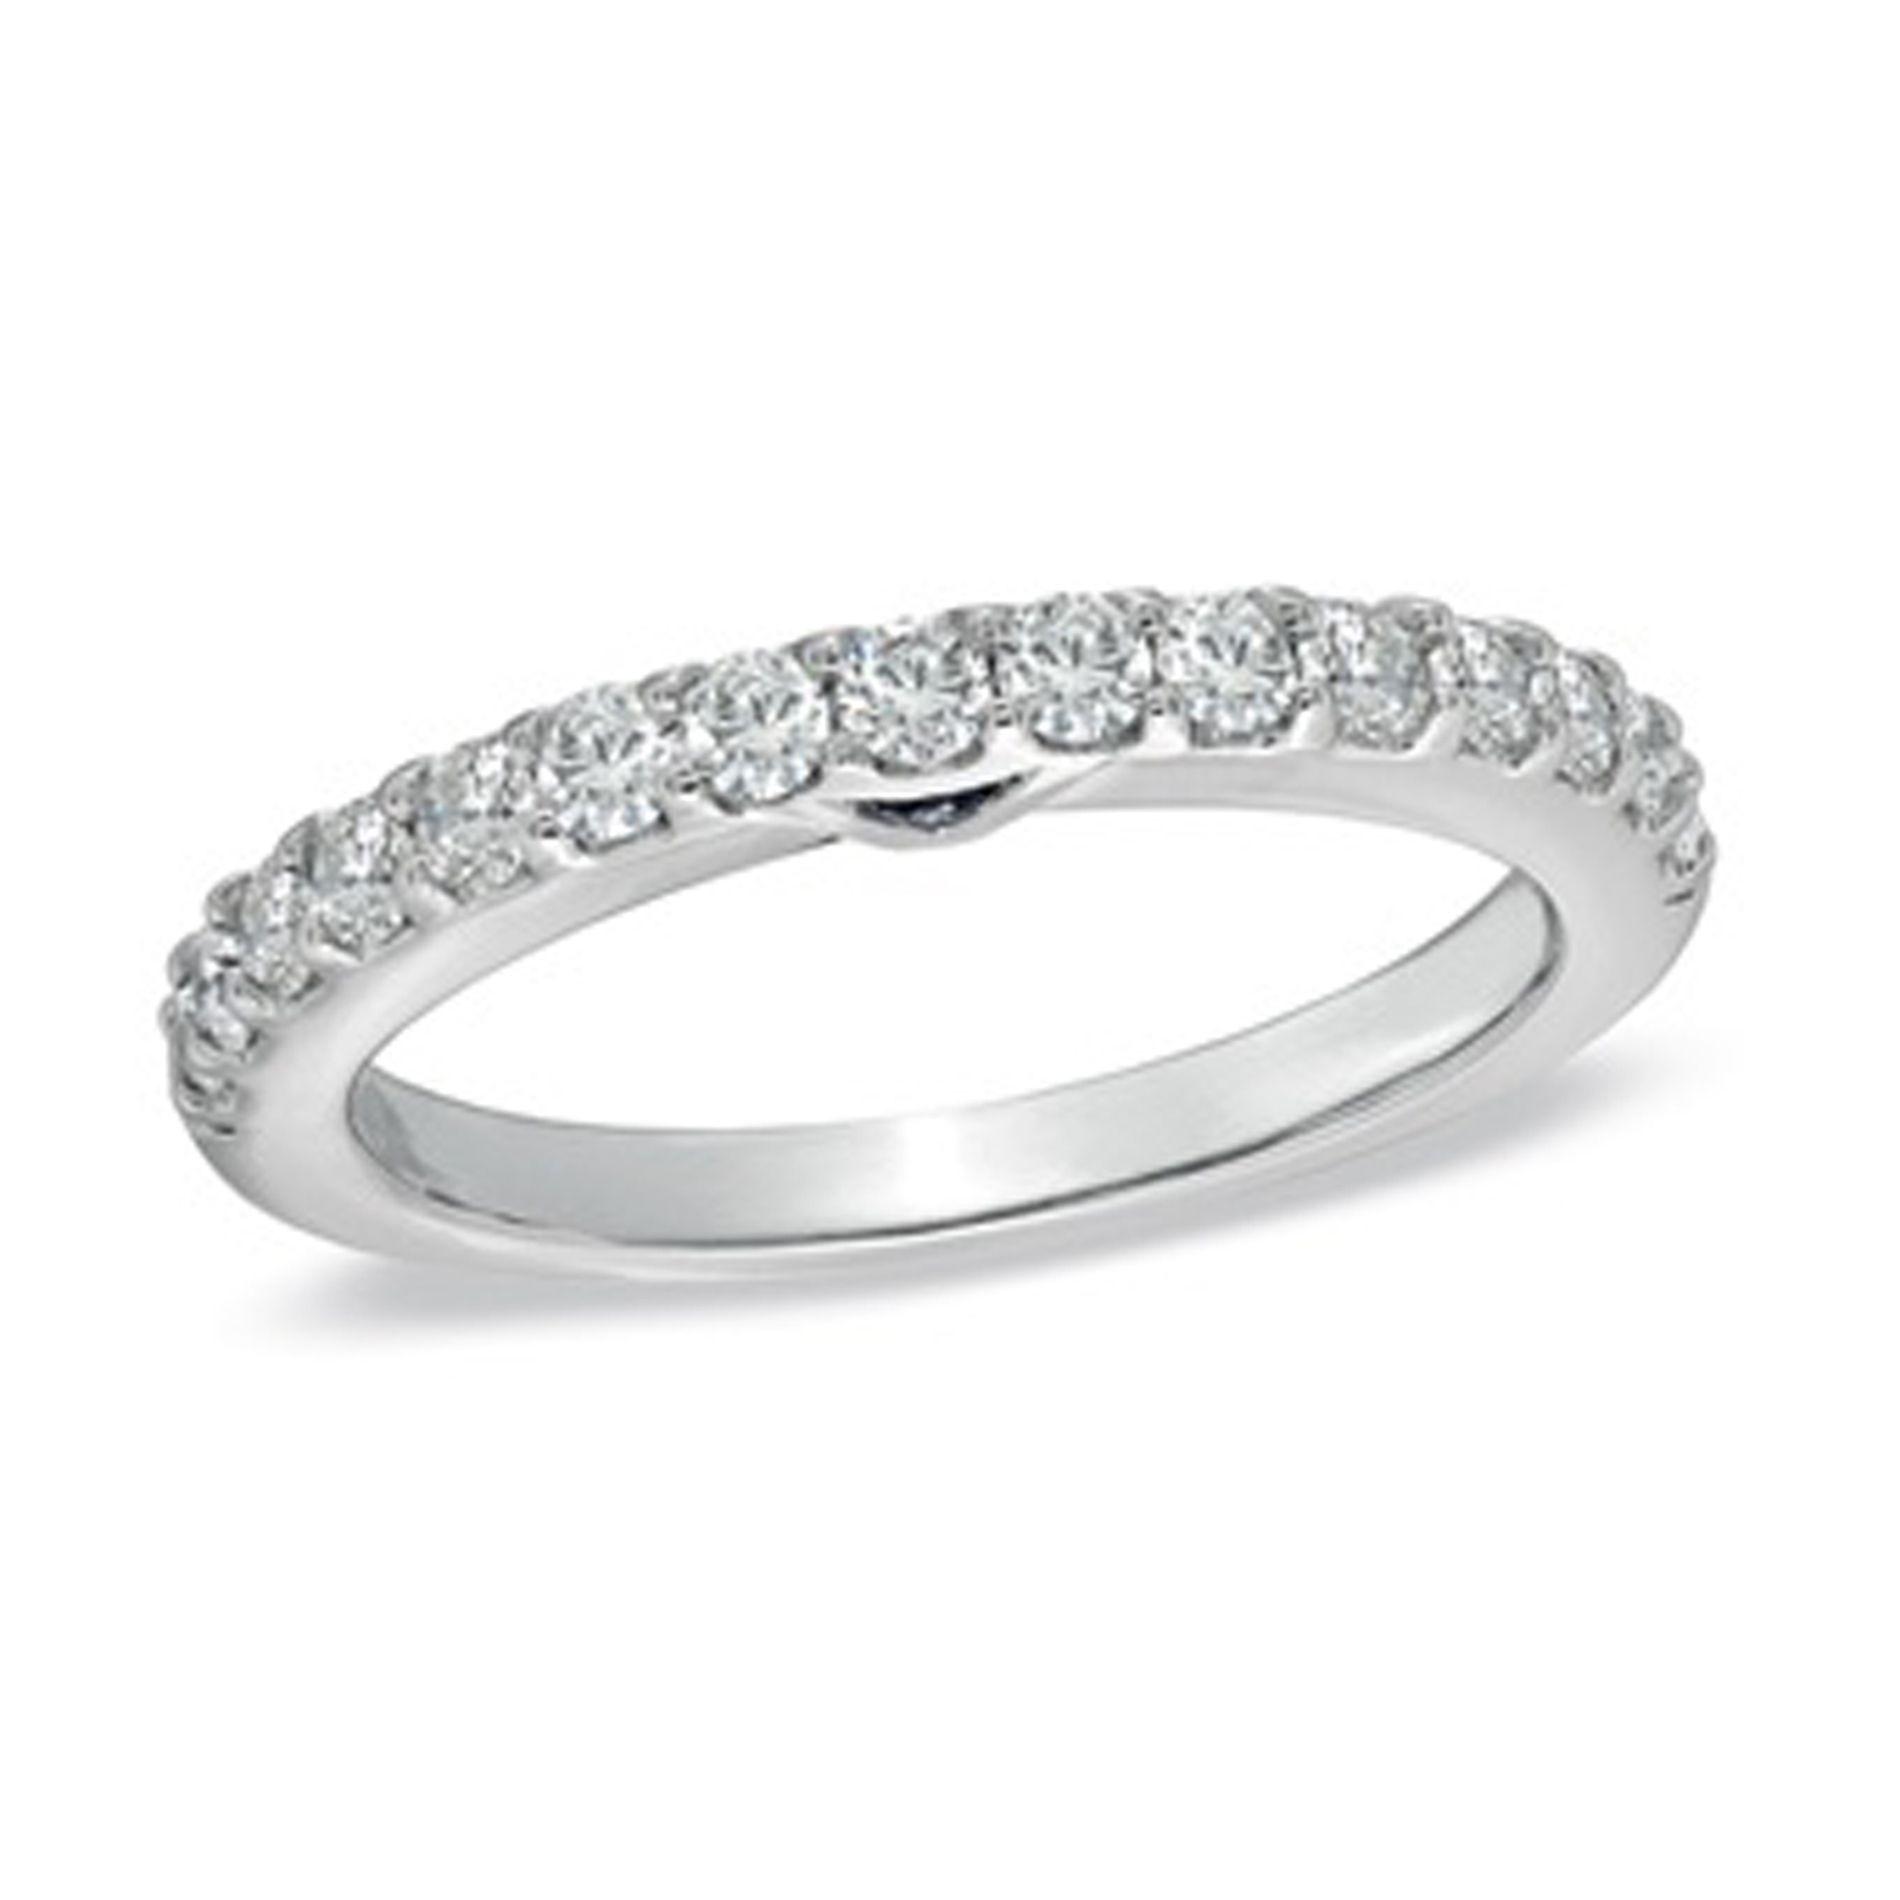 Bands Women Diamond Wedding Zales S Directories Cartier Rings Ideas Planning Tips